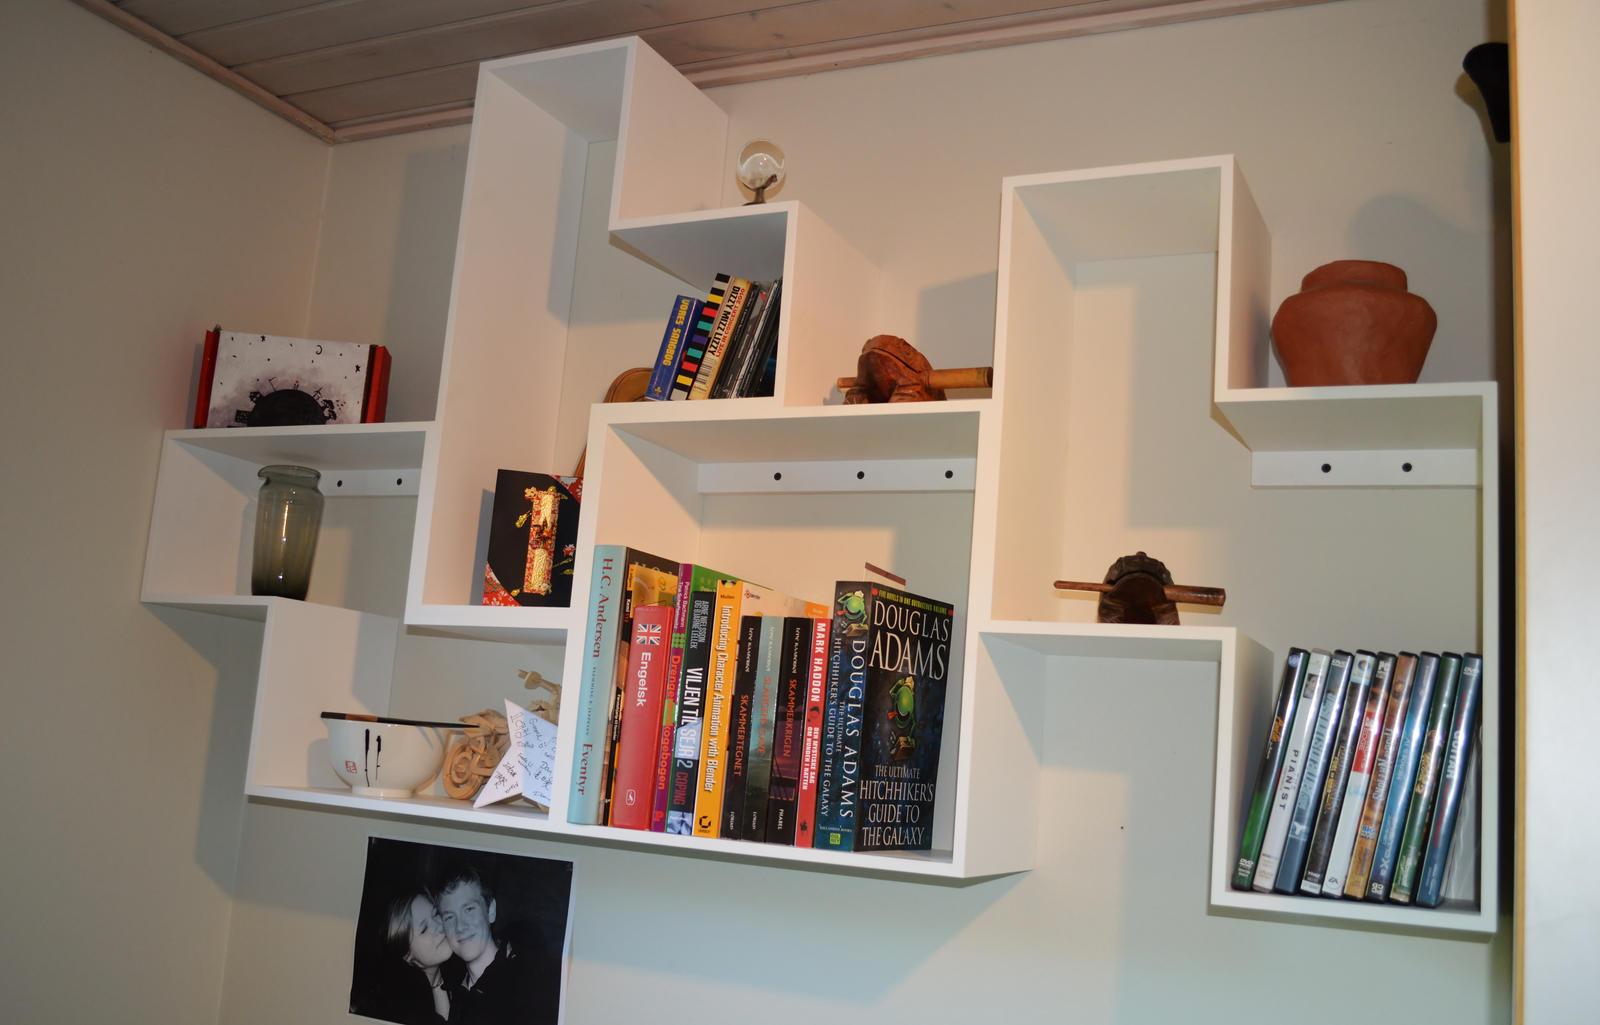 Tetris shelves by Happyzipper on DeviantArt